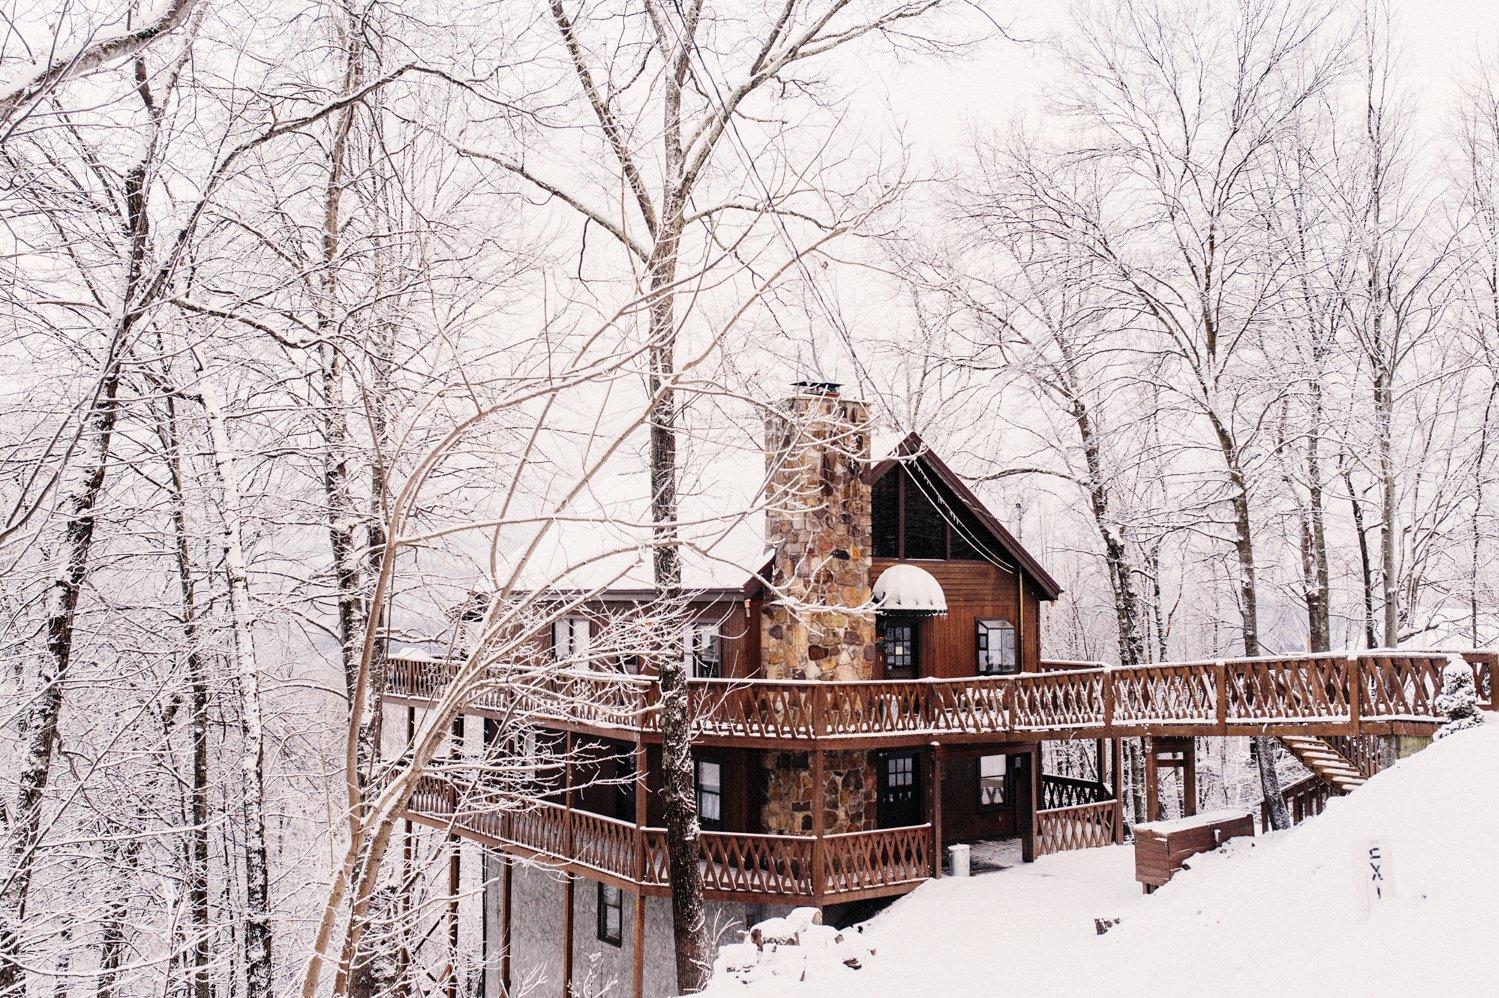 Gatlinburg snow storm